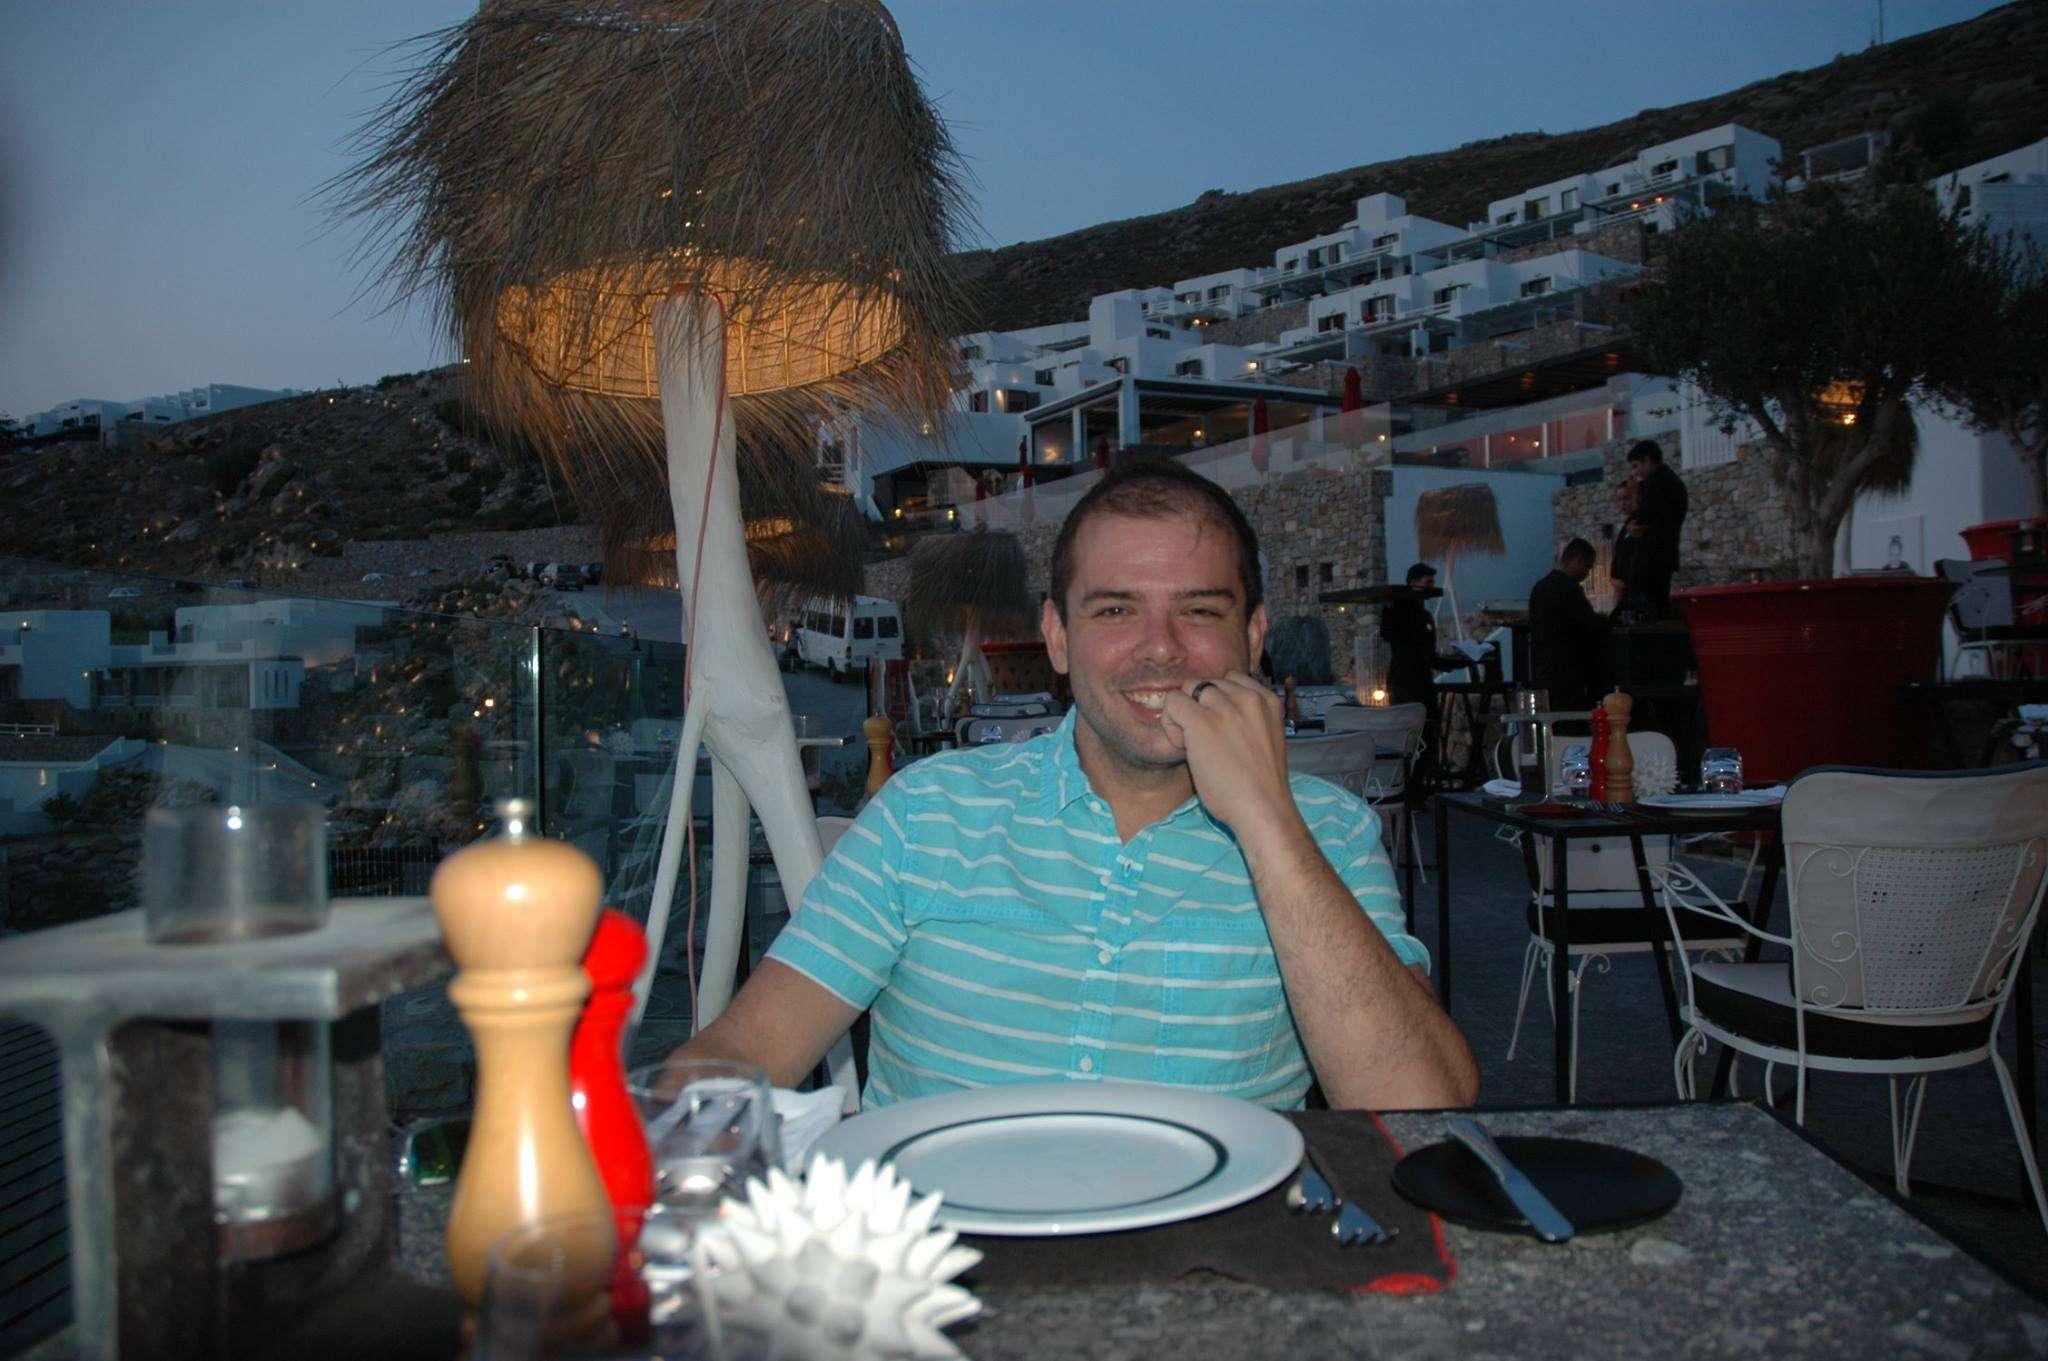 Enjoying a romantic dinner at the AVATON Restaurant